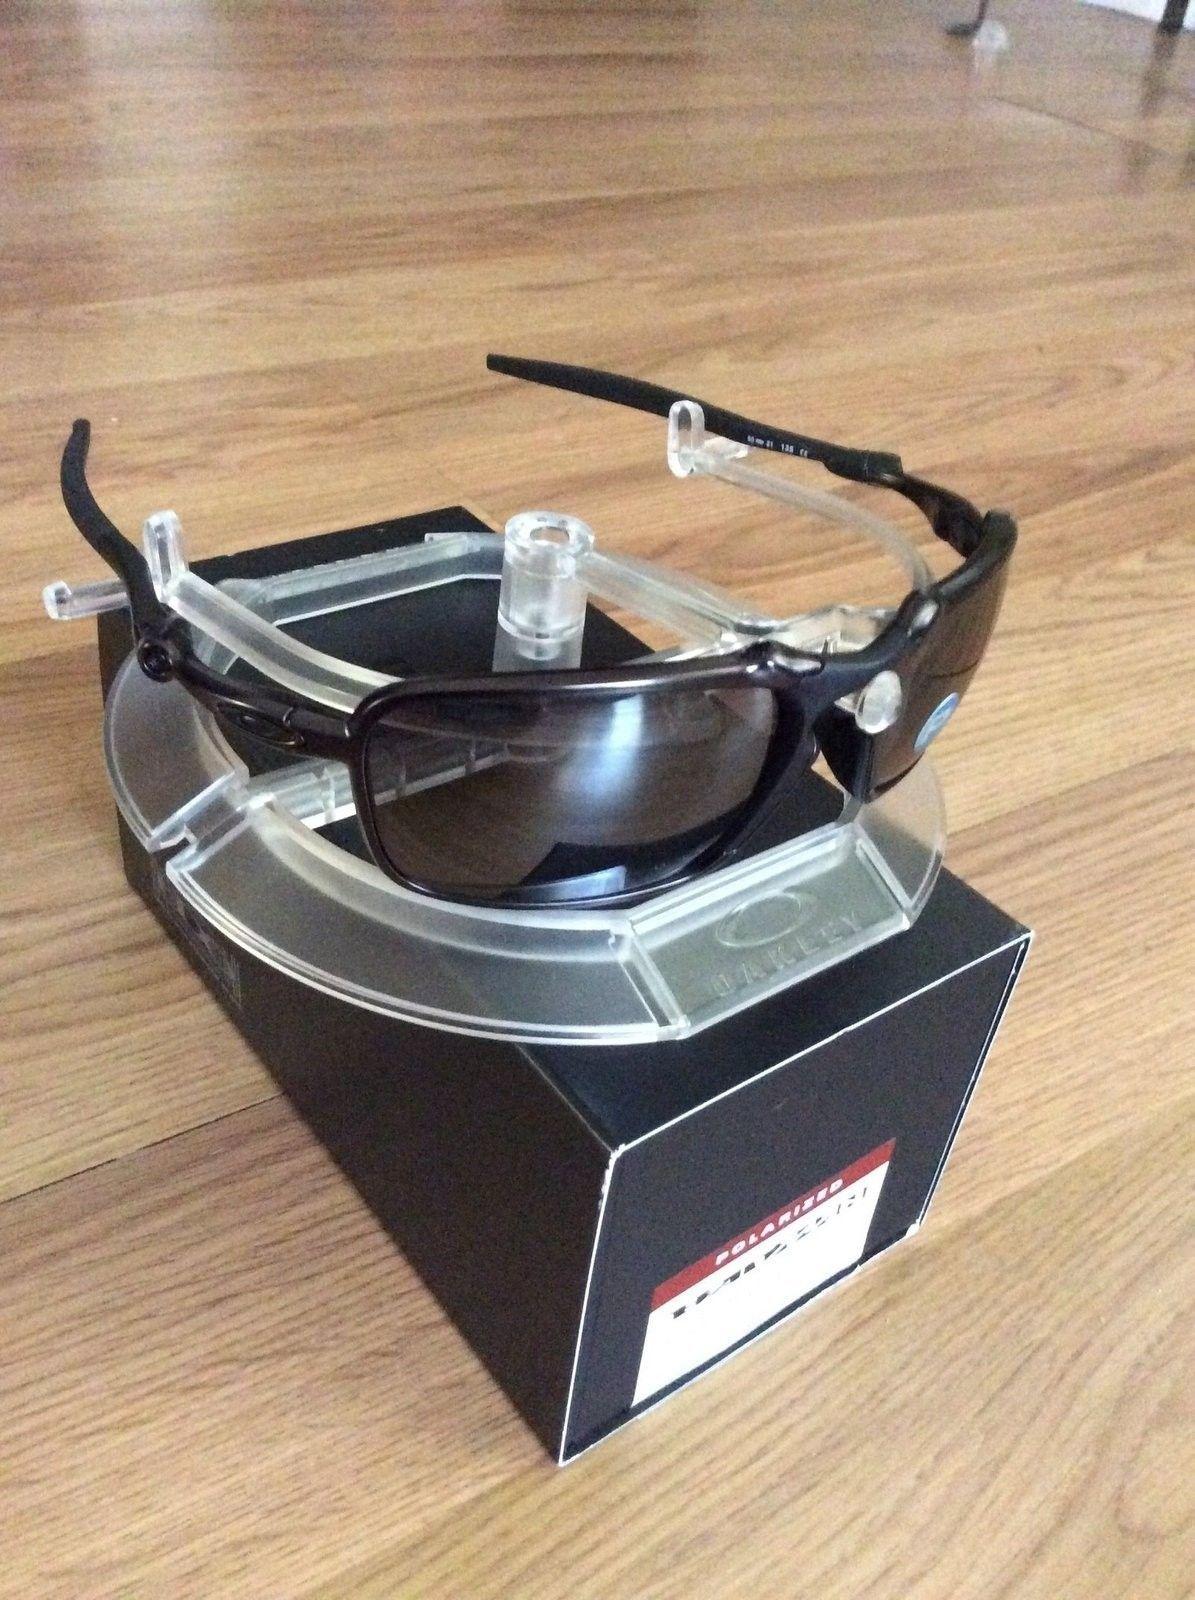 BNIB Oakley Badman $225  Shipped - image.jpg